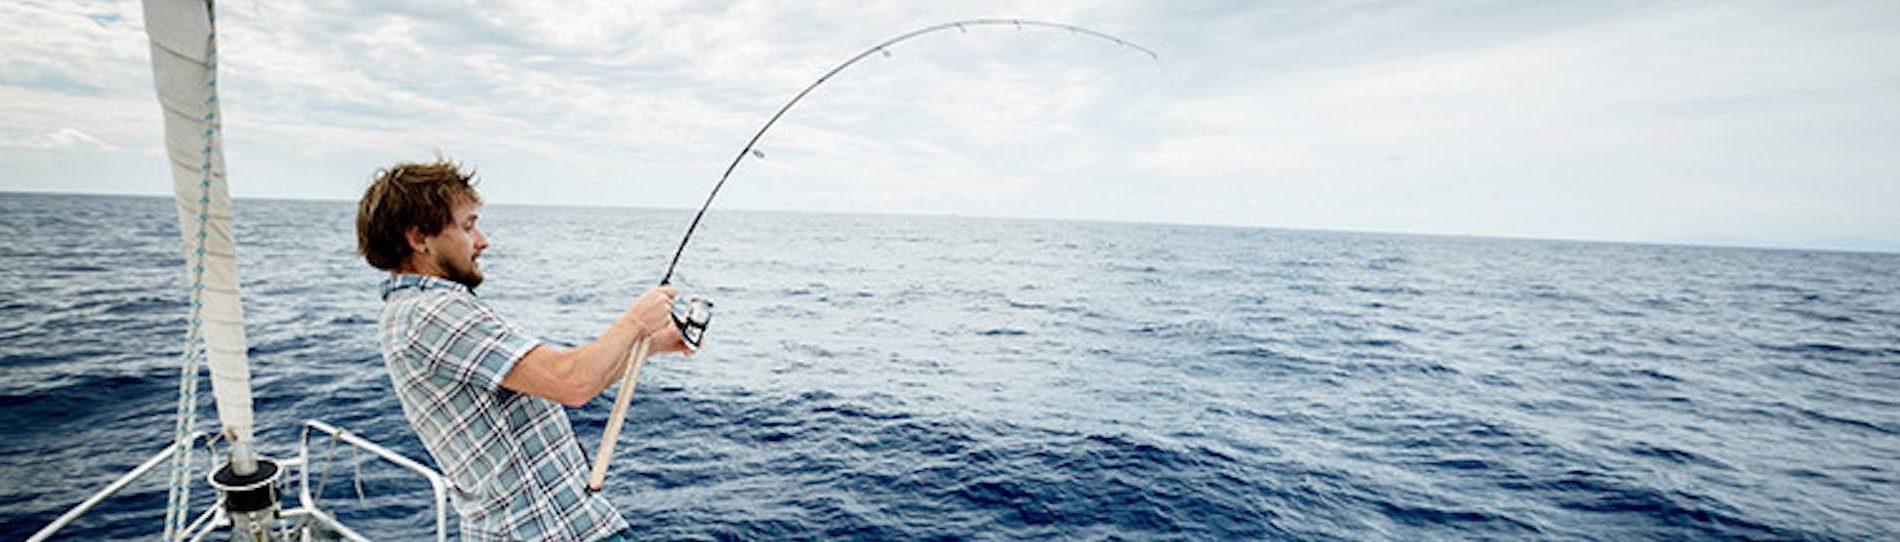 group of bucks deep sea fishing